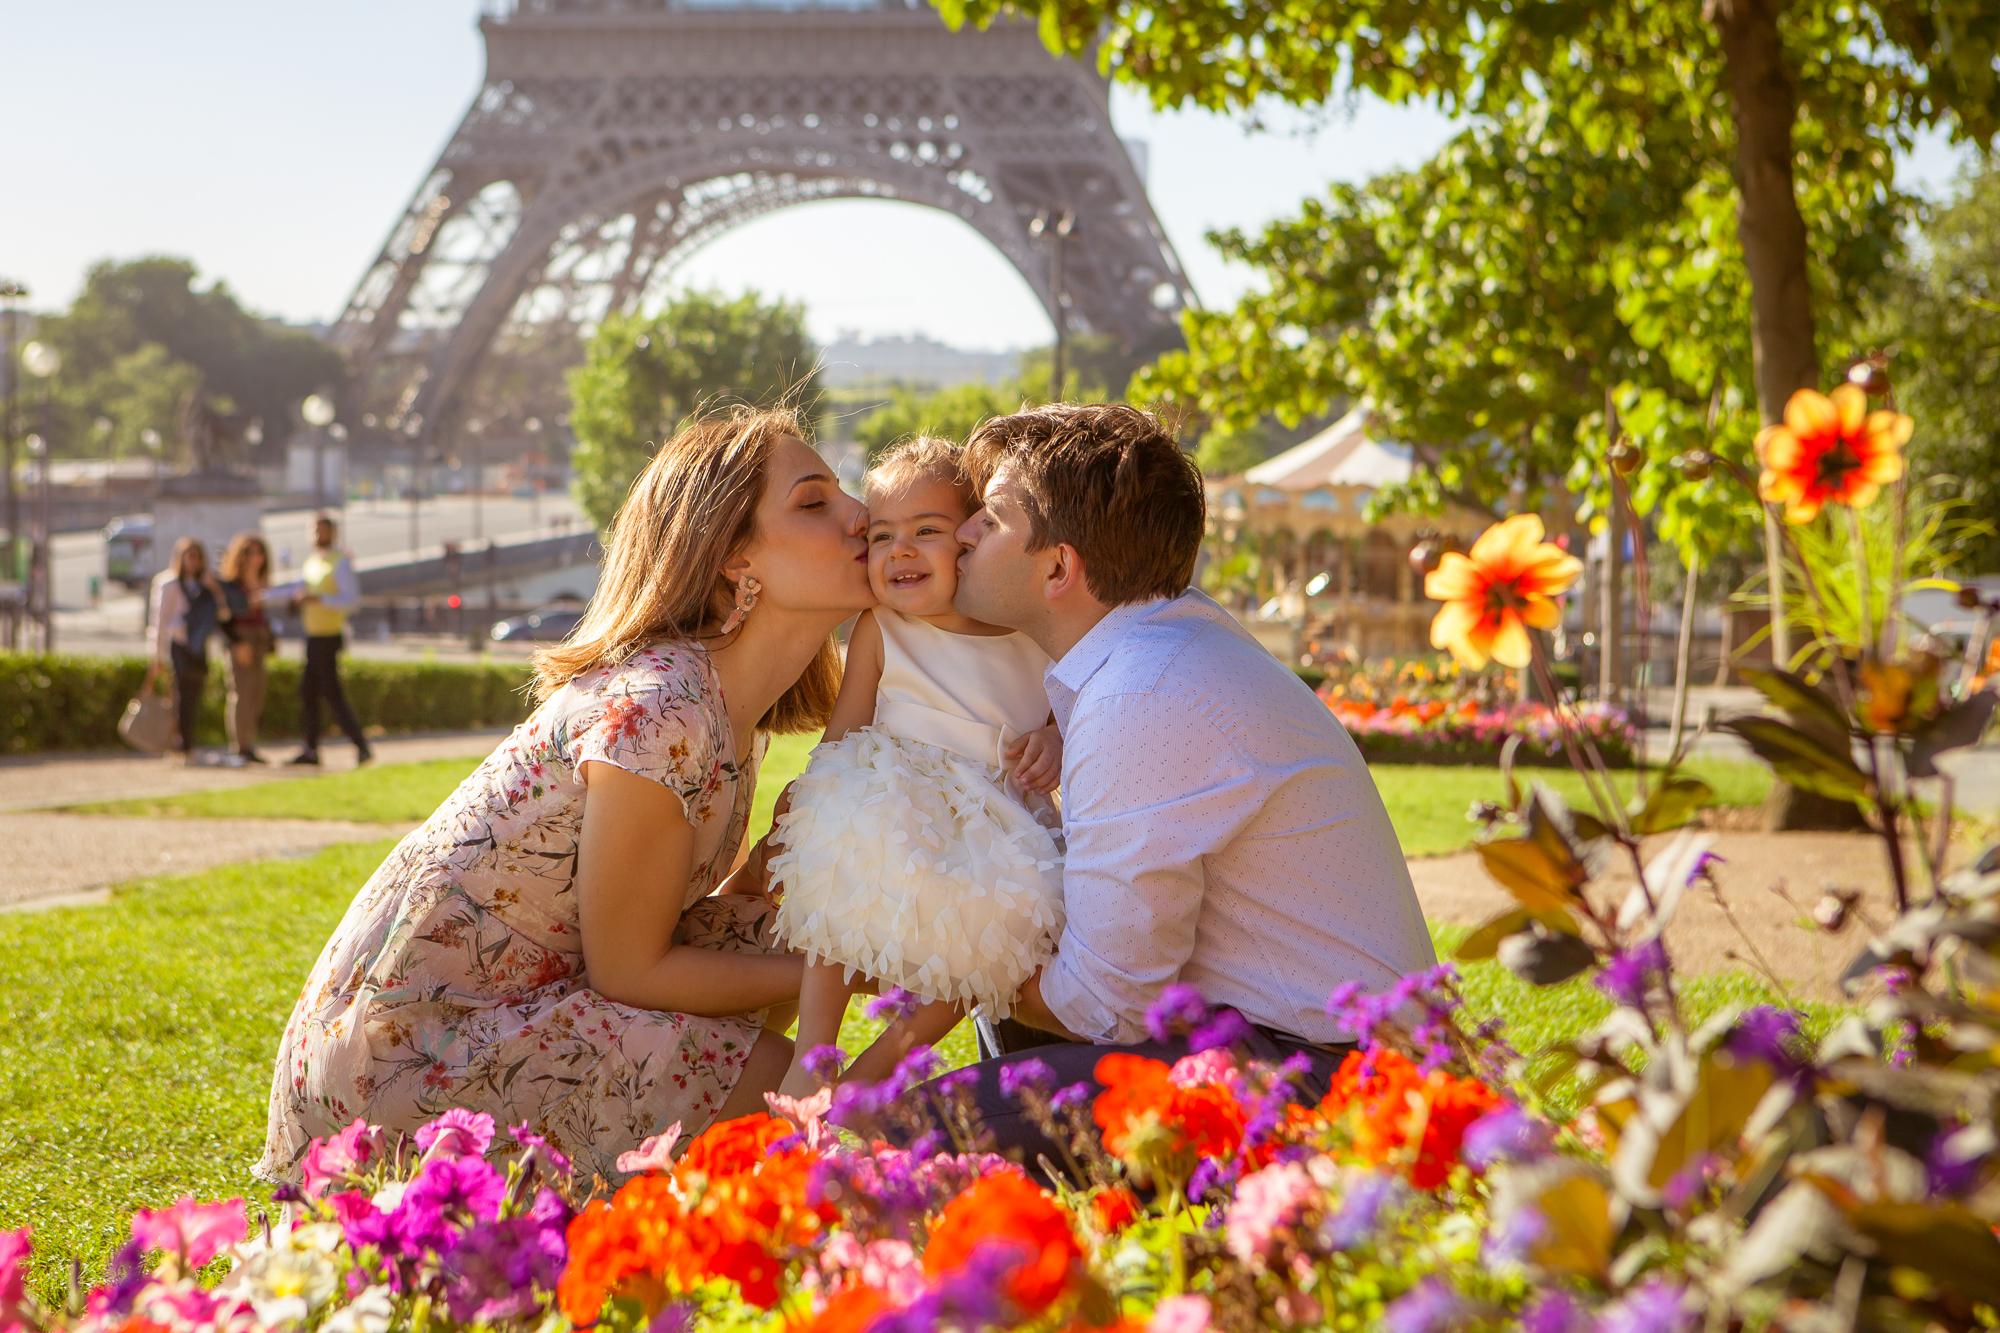 Family photoshoot in Paris